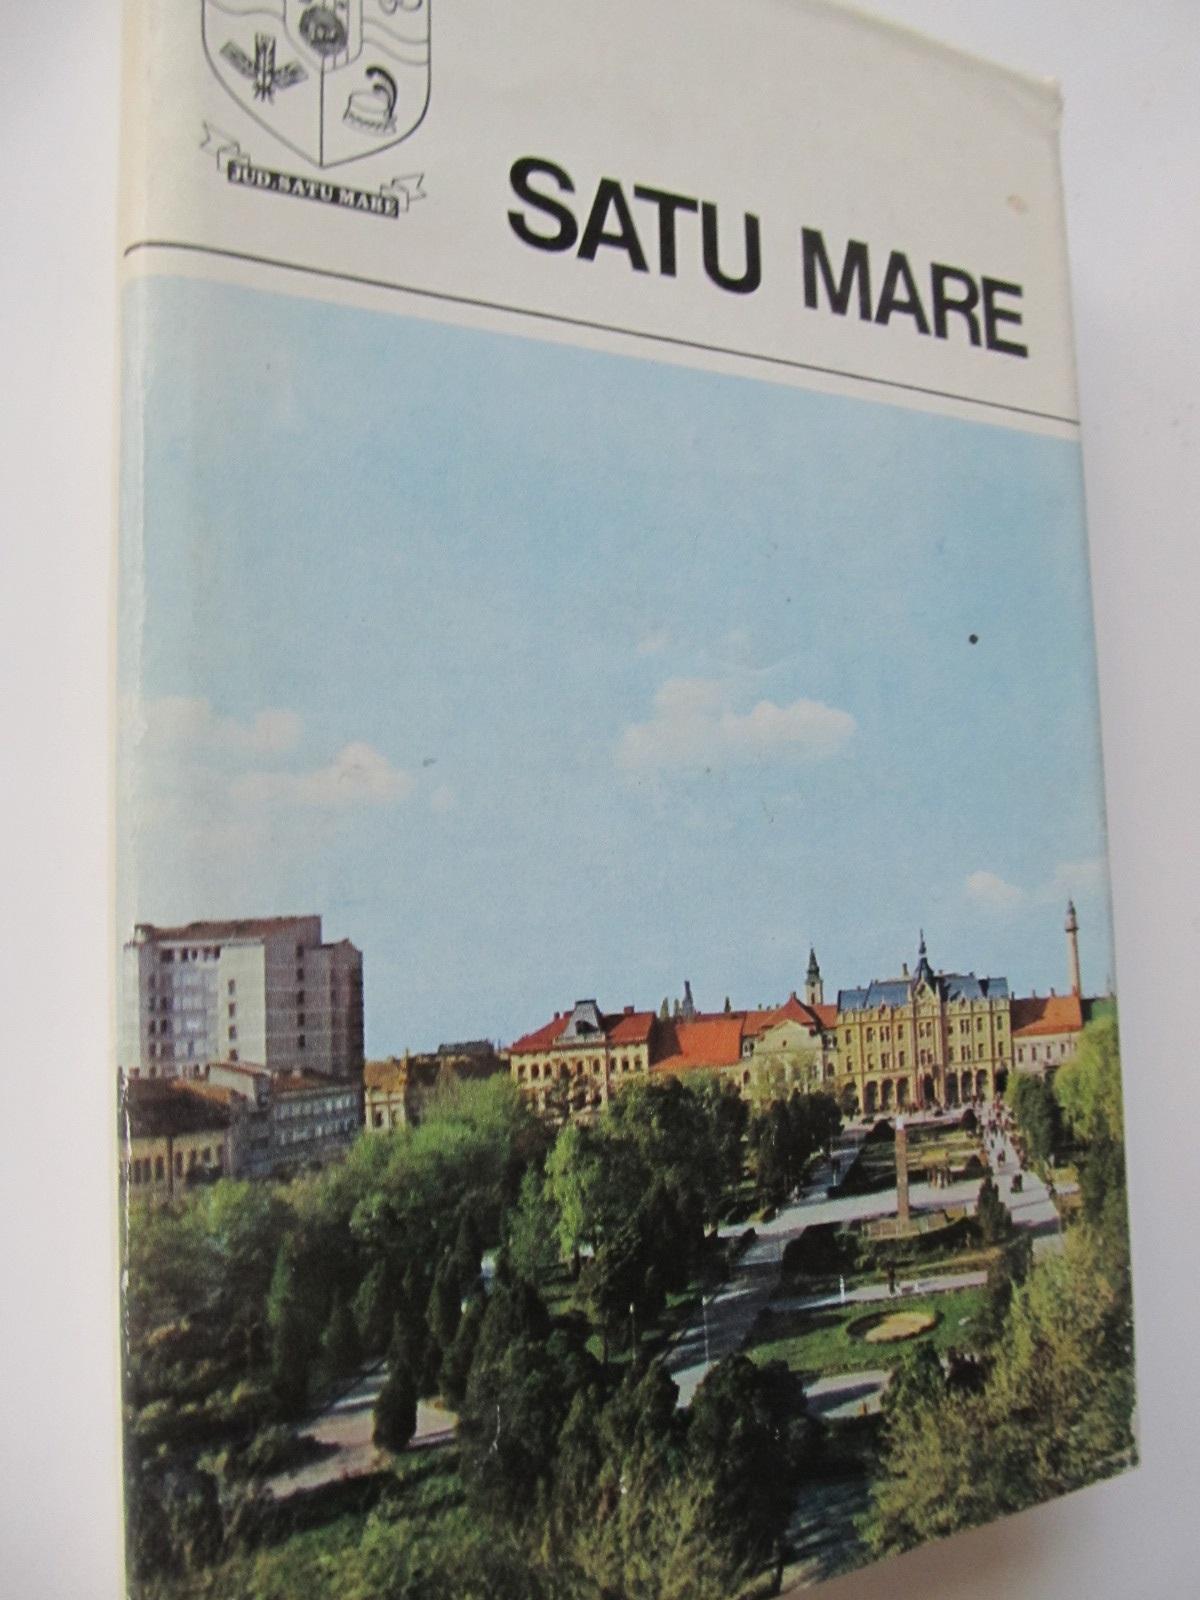 Judetele patriei - Judetul Satu Mare - Monografie - Ioan Caita , ... | Detalii carte